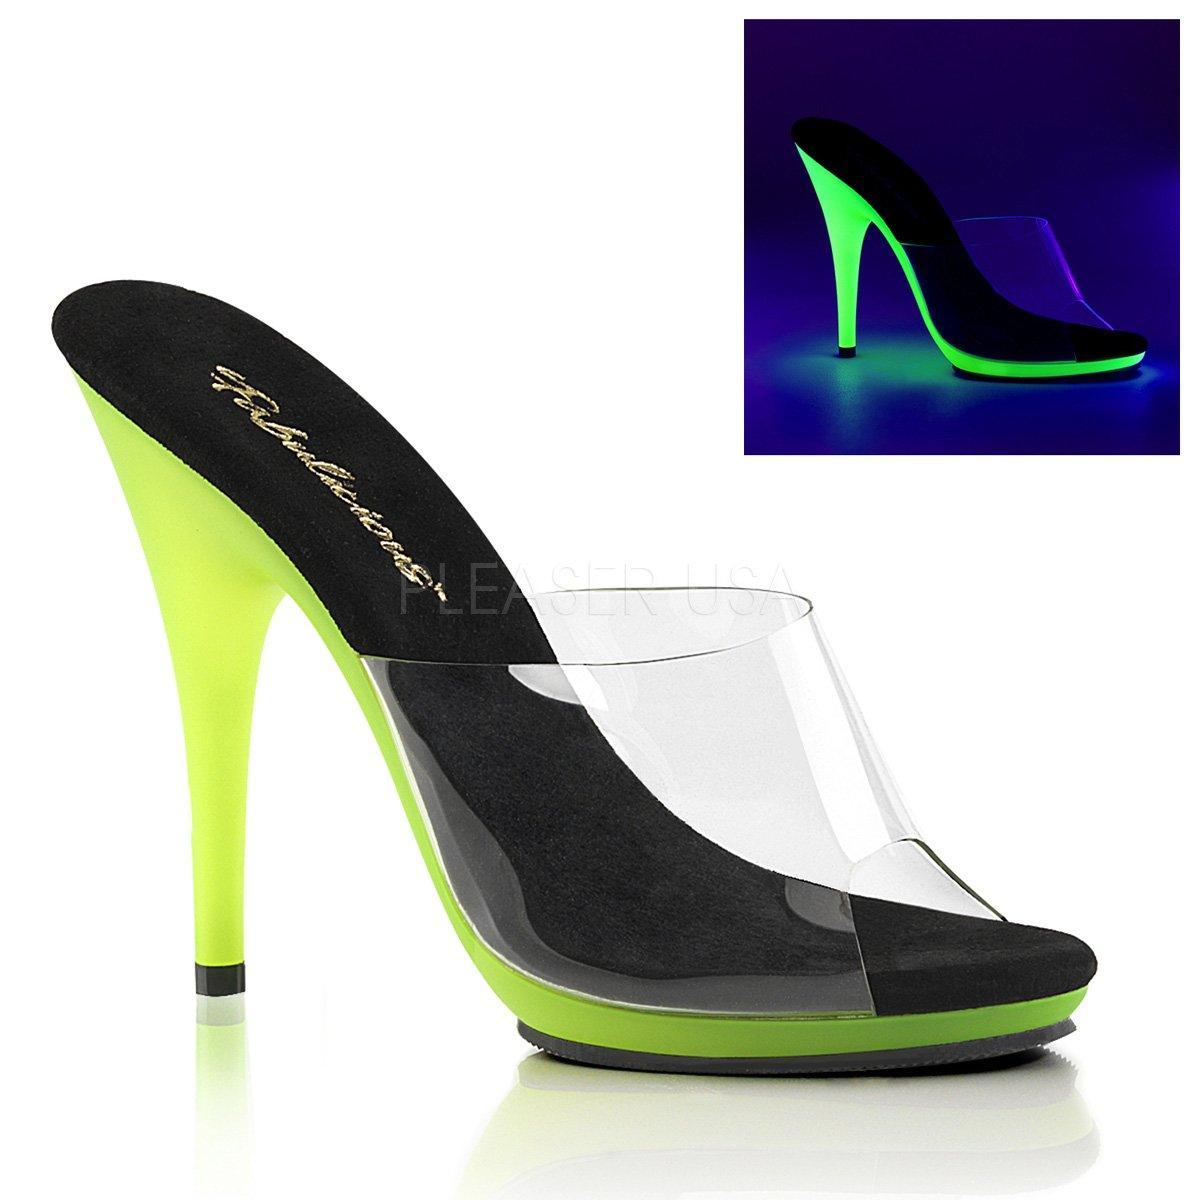 POISE-501UV Pantofle a nazouváky  bf2d002c16